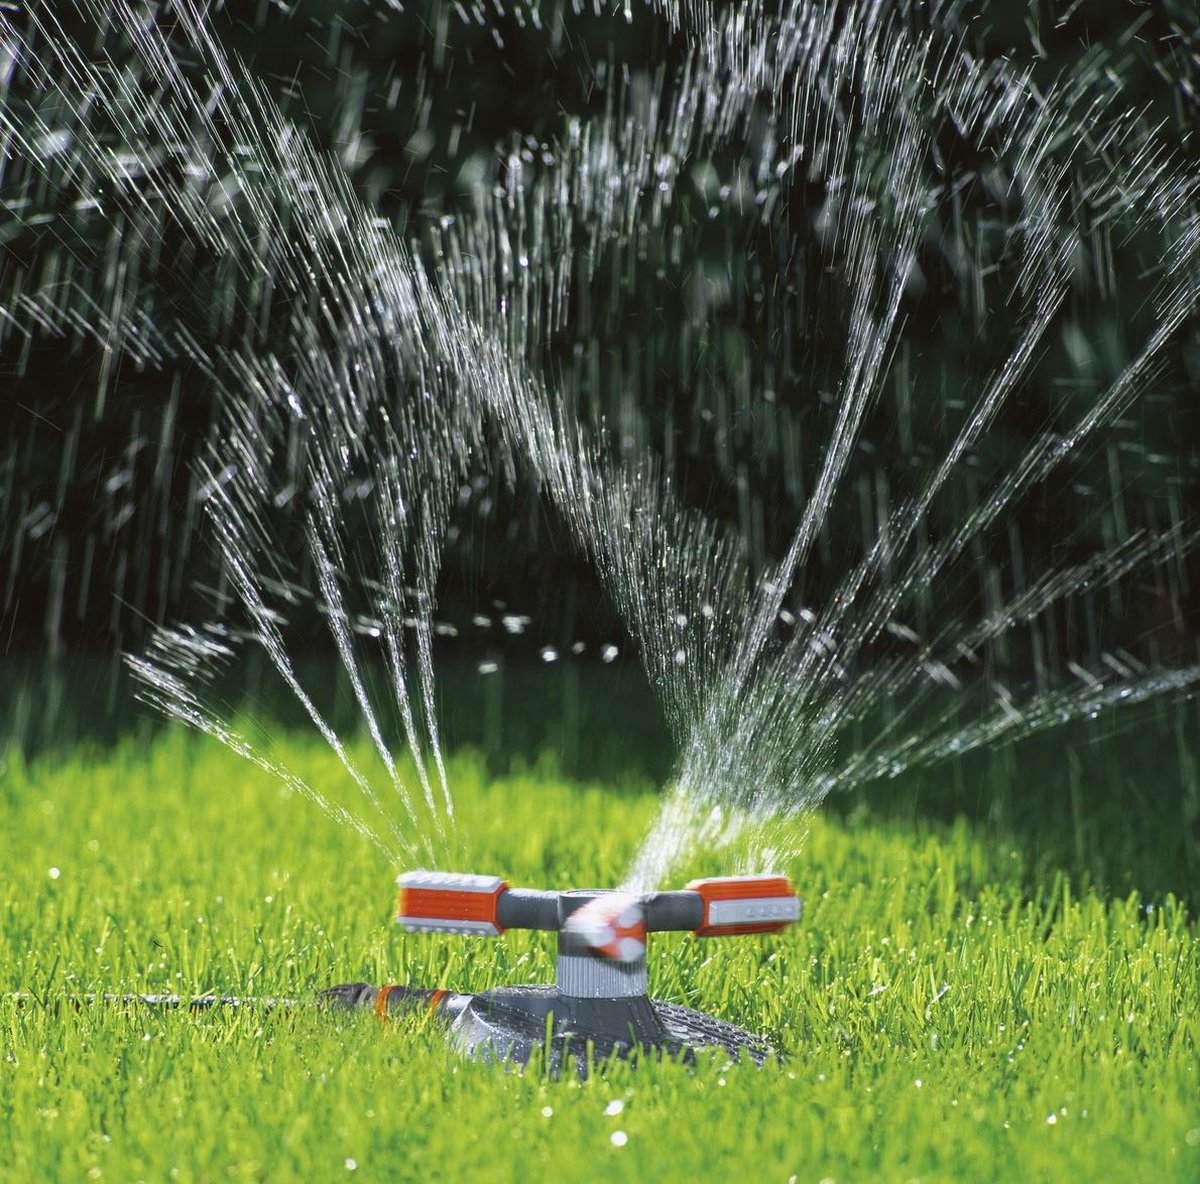 gardena_cirkelsproeier_irrigatiesysteem_tuin_sproeier